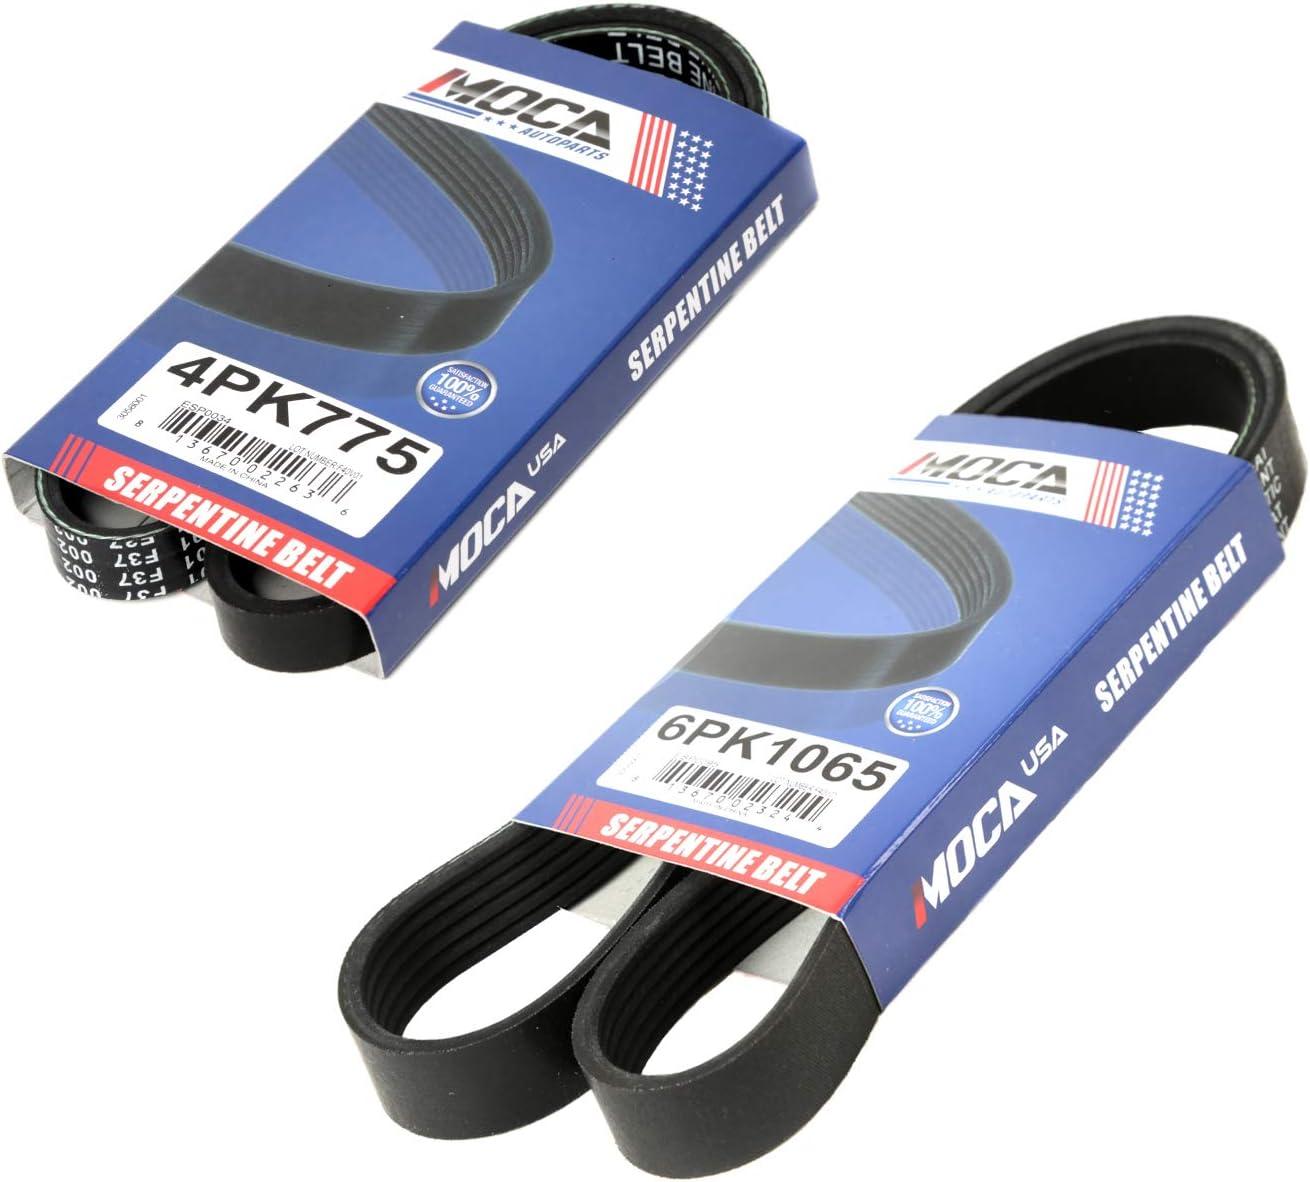 2006 dodge ram 1500 serpentine belt diagram v6 amazon com moca 4pk775 6pk1065 epdm serpentine belt professional  epdm serpentine belt